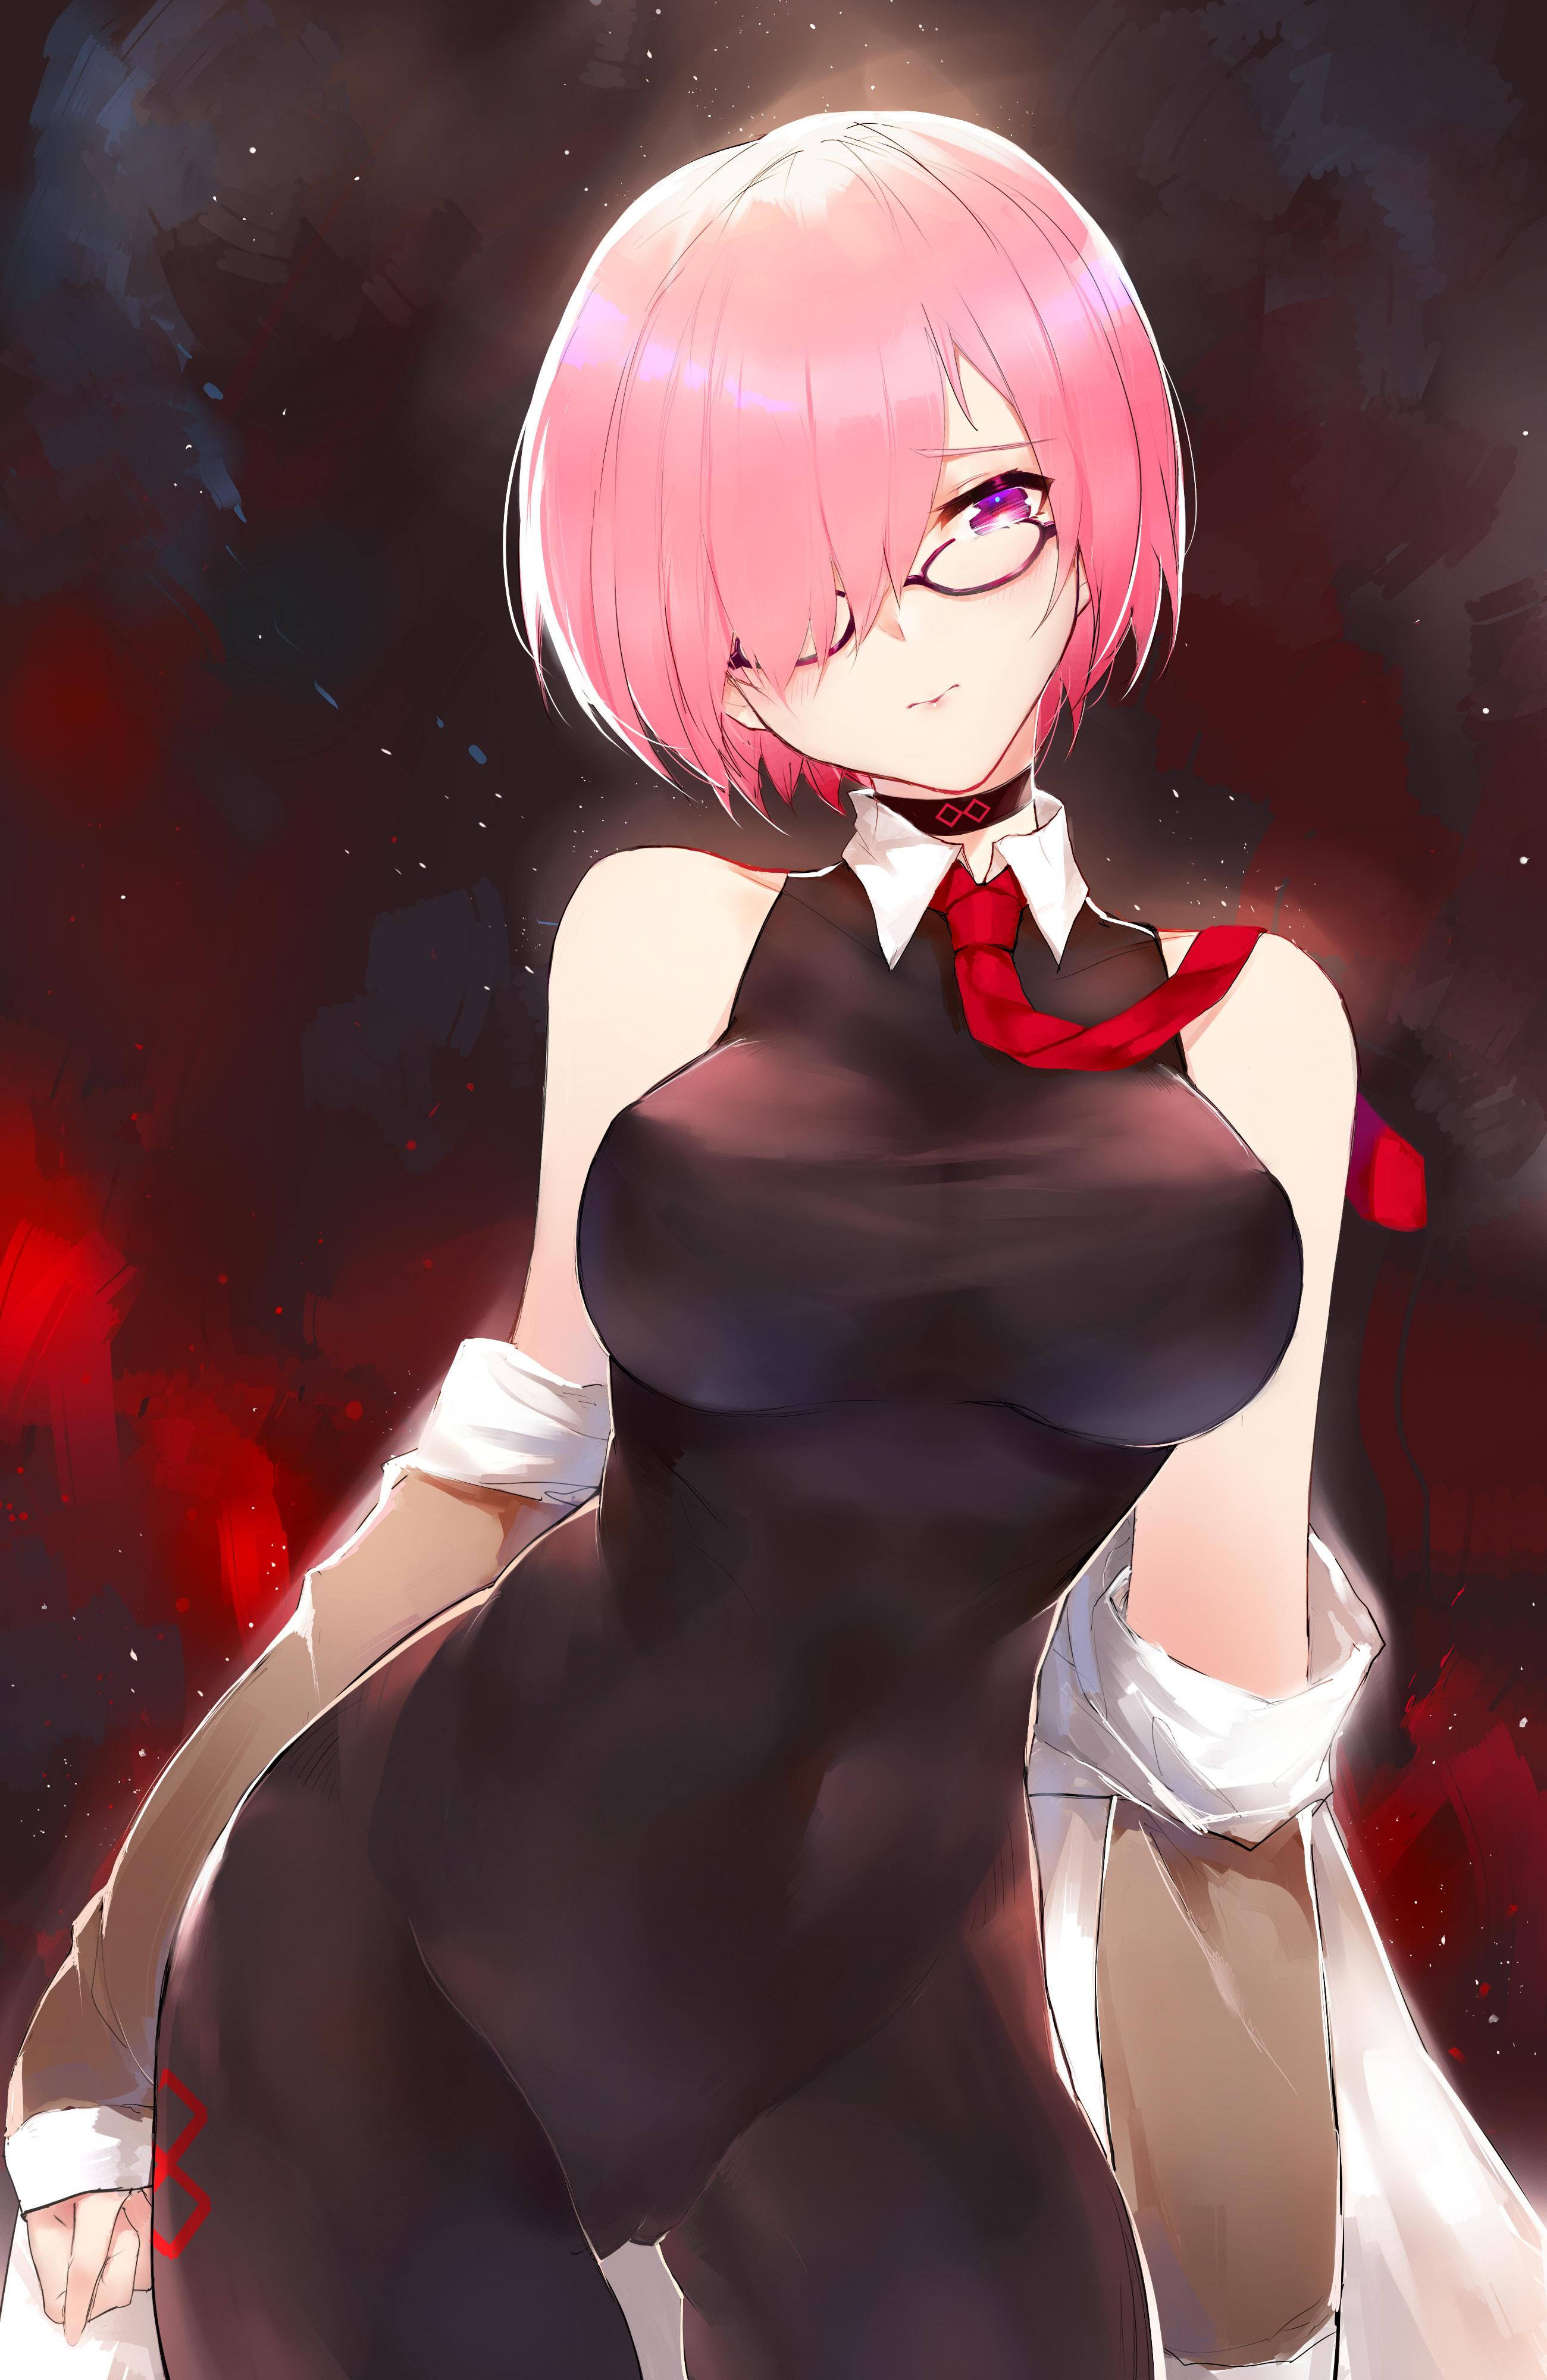 Anime 2600x4000 bodysuit cameltoe Fate/Grand Order glasses Mash Kyrielight hard nipples